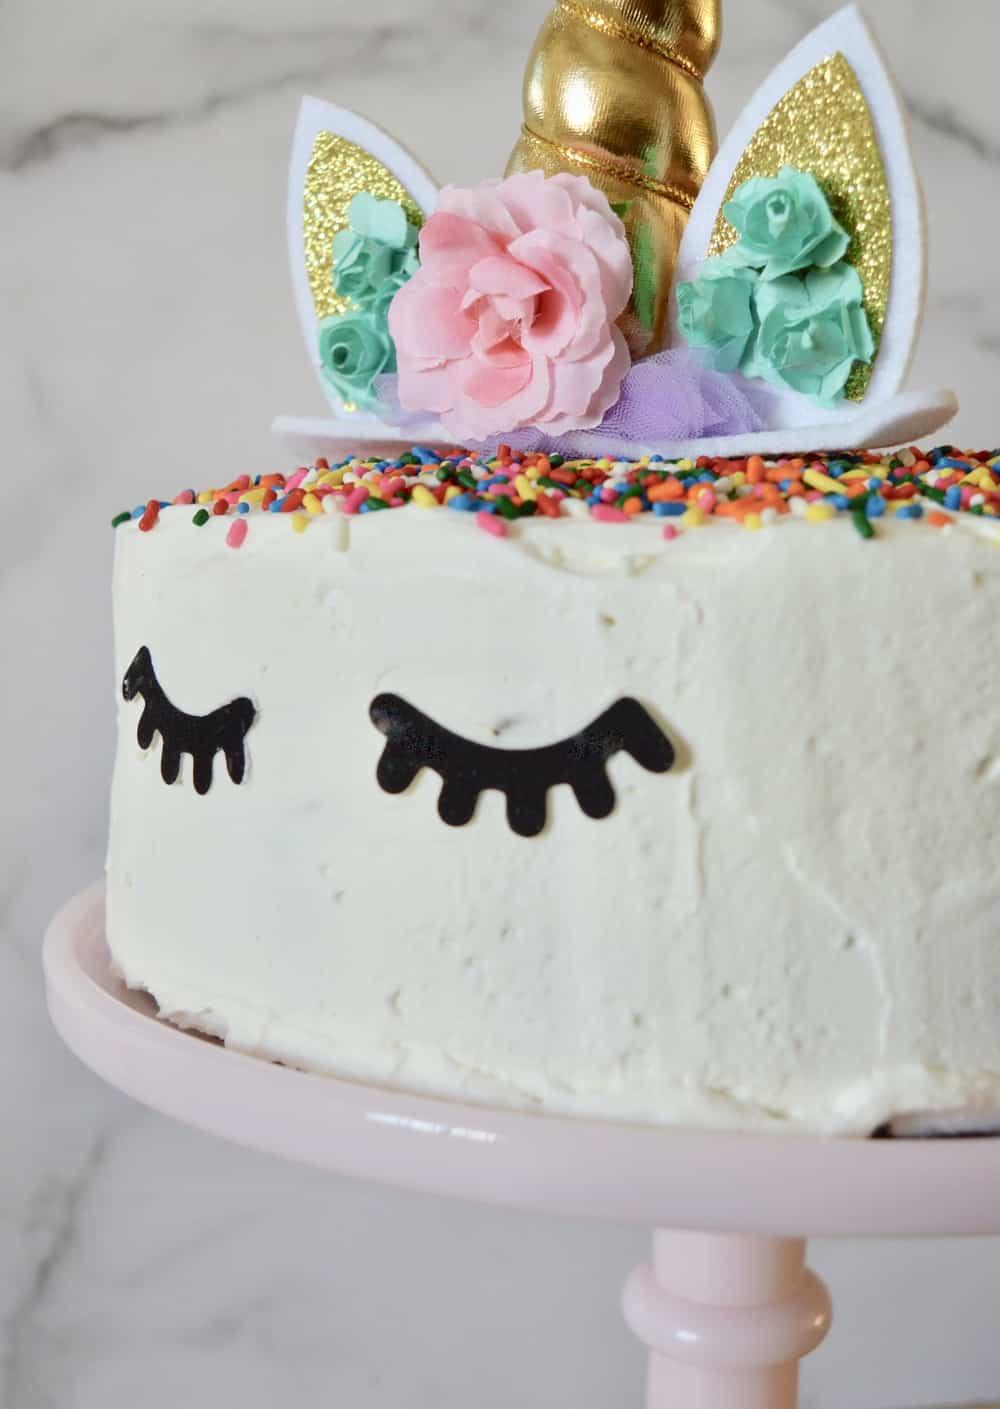 unicorn ice cream cake.